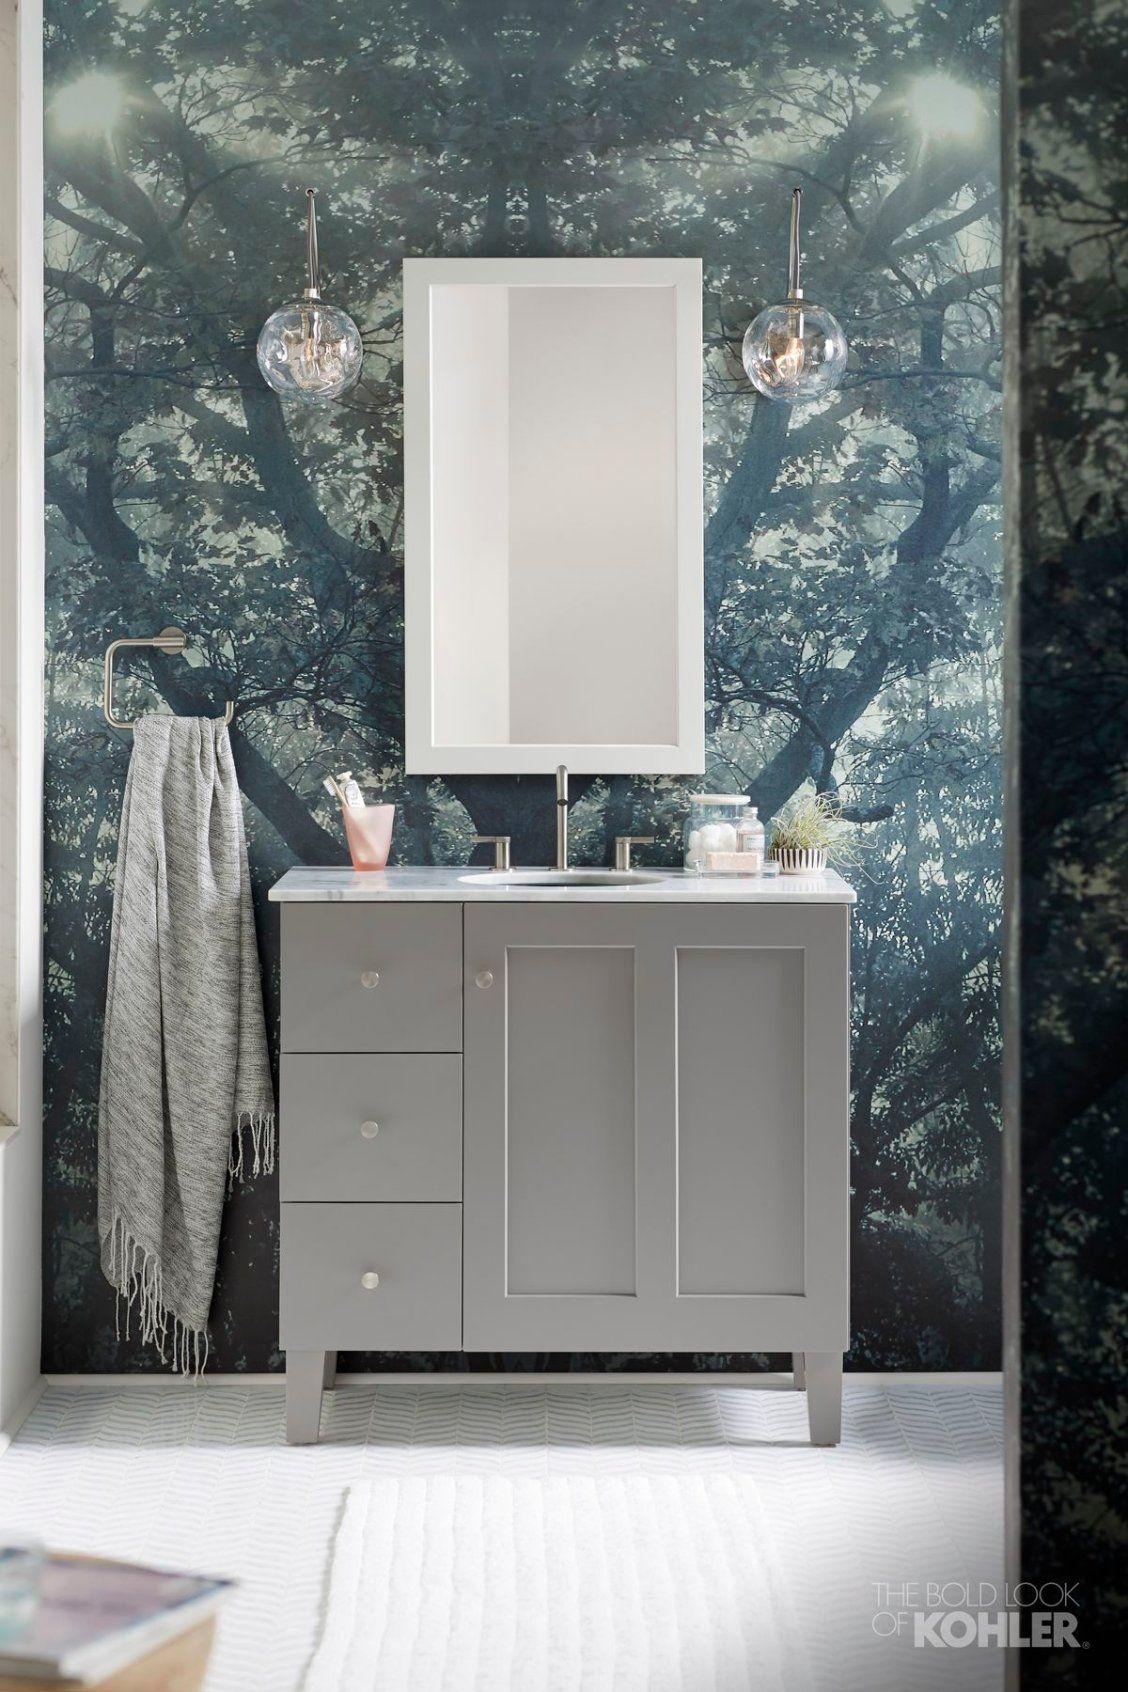 Nordic Lights Bathroom Kohler Ideas Bathrooms Designs Pictures Small Bathroom Vanities Small Bathroom Furniture